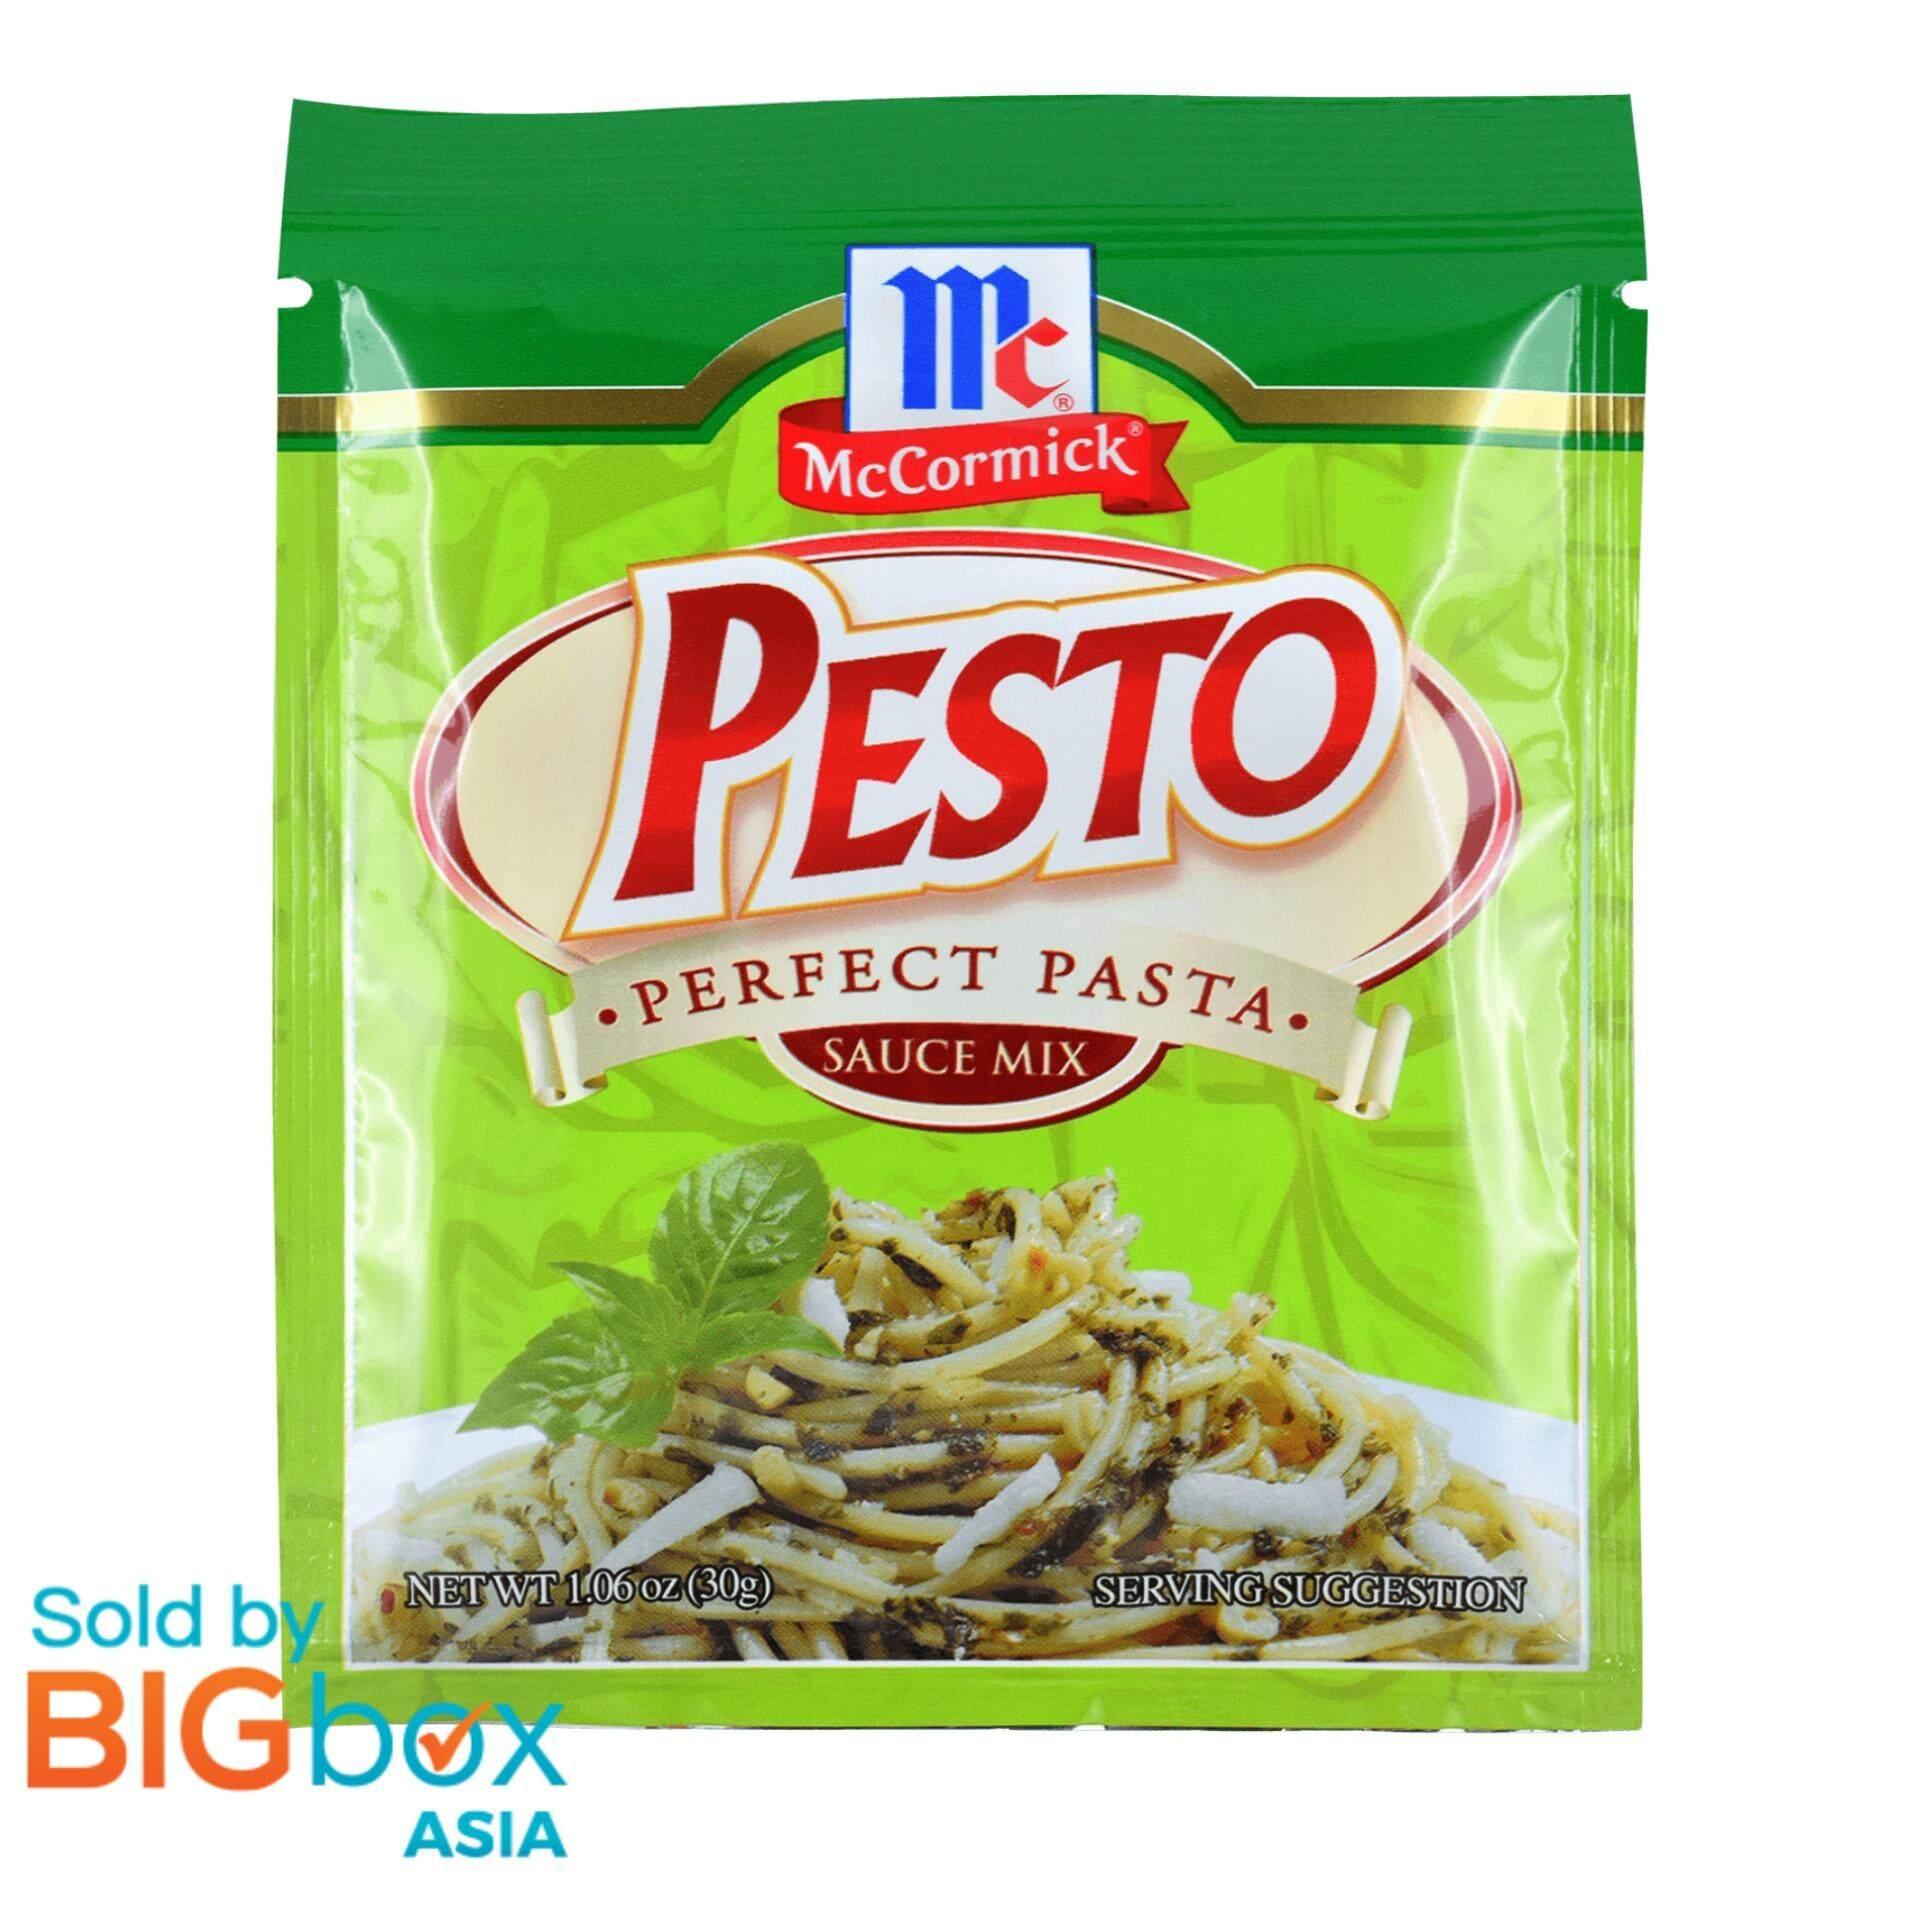 McCormick Perfect Pasta Mixes 30g - Pesto